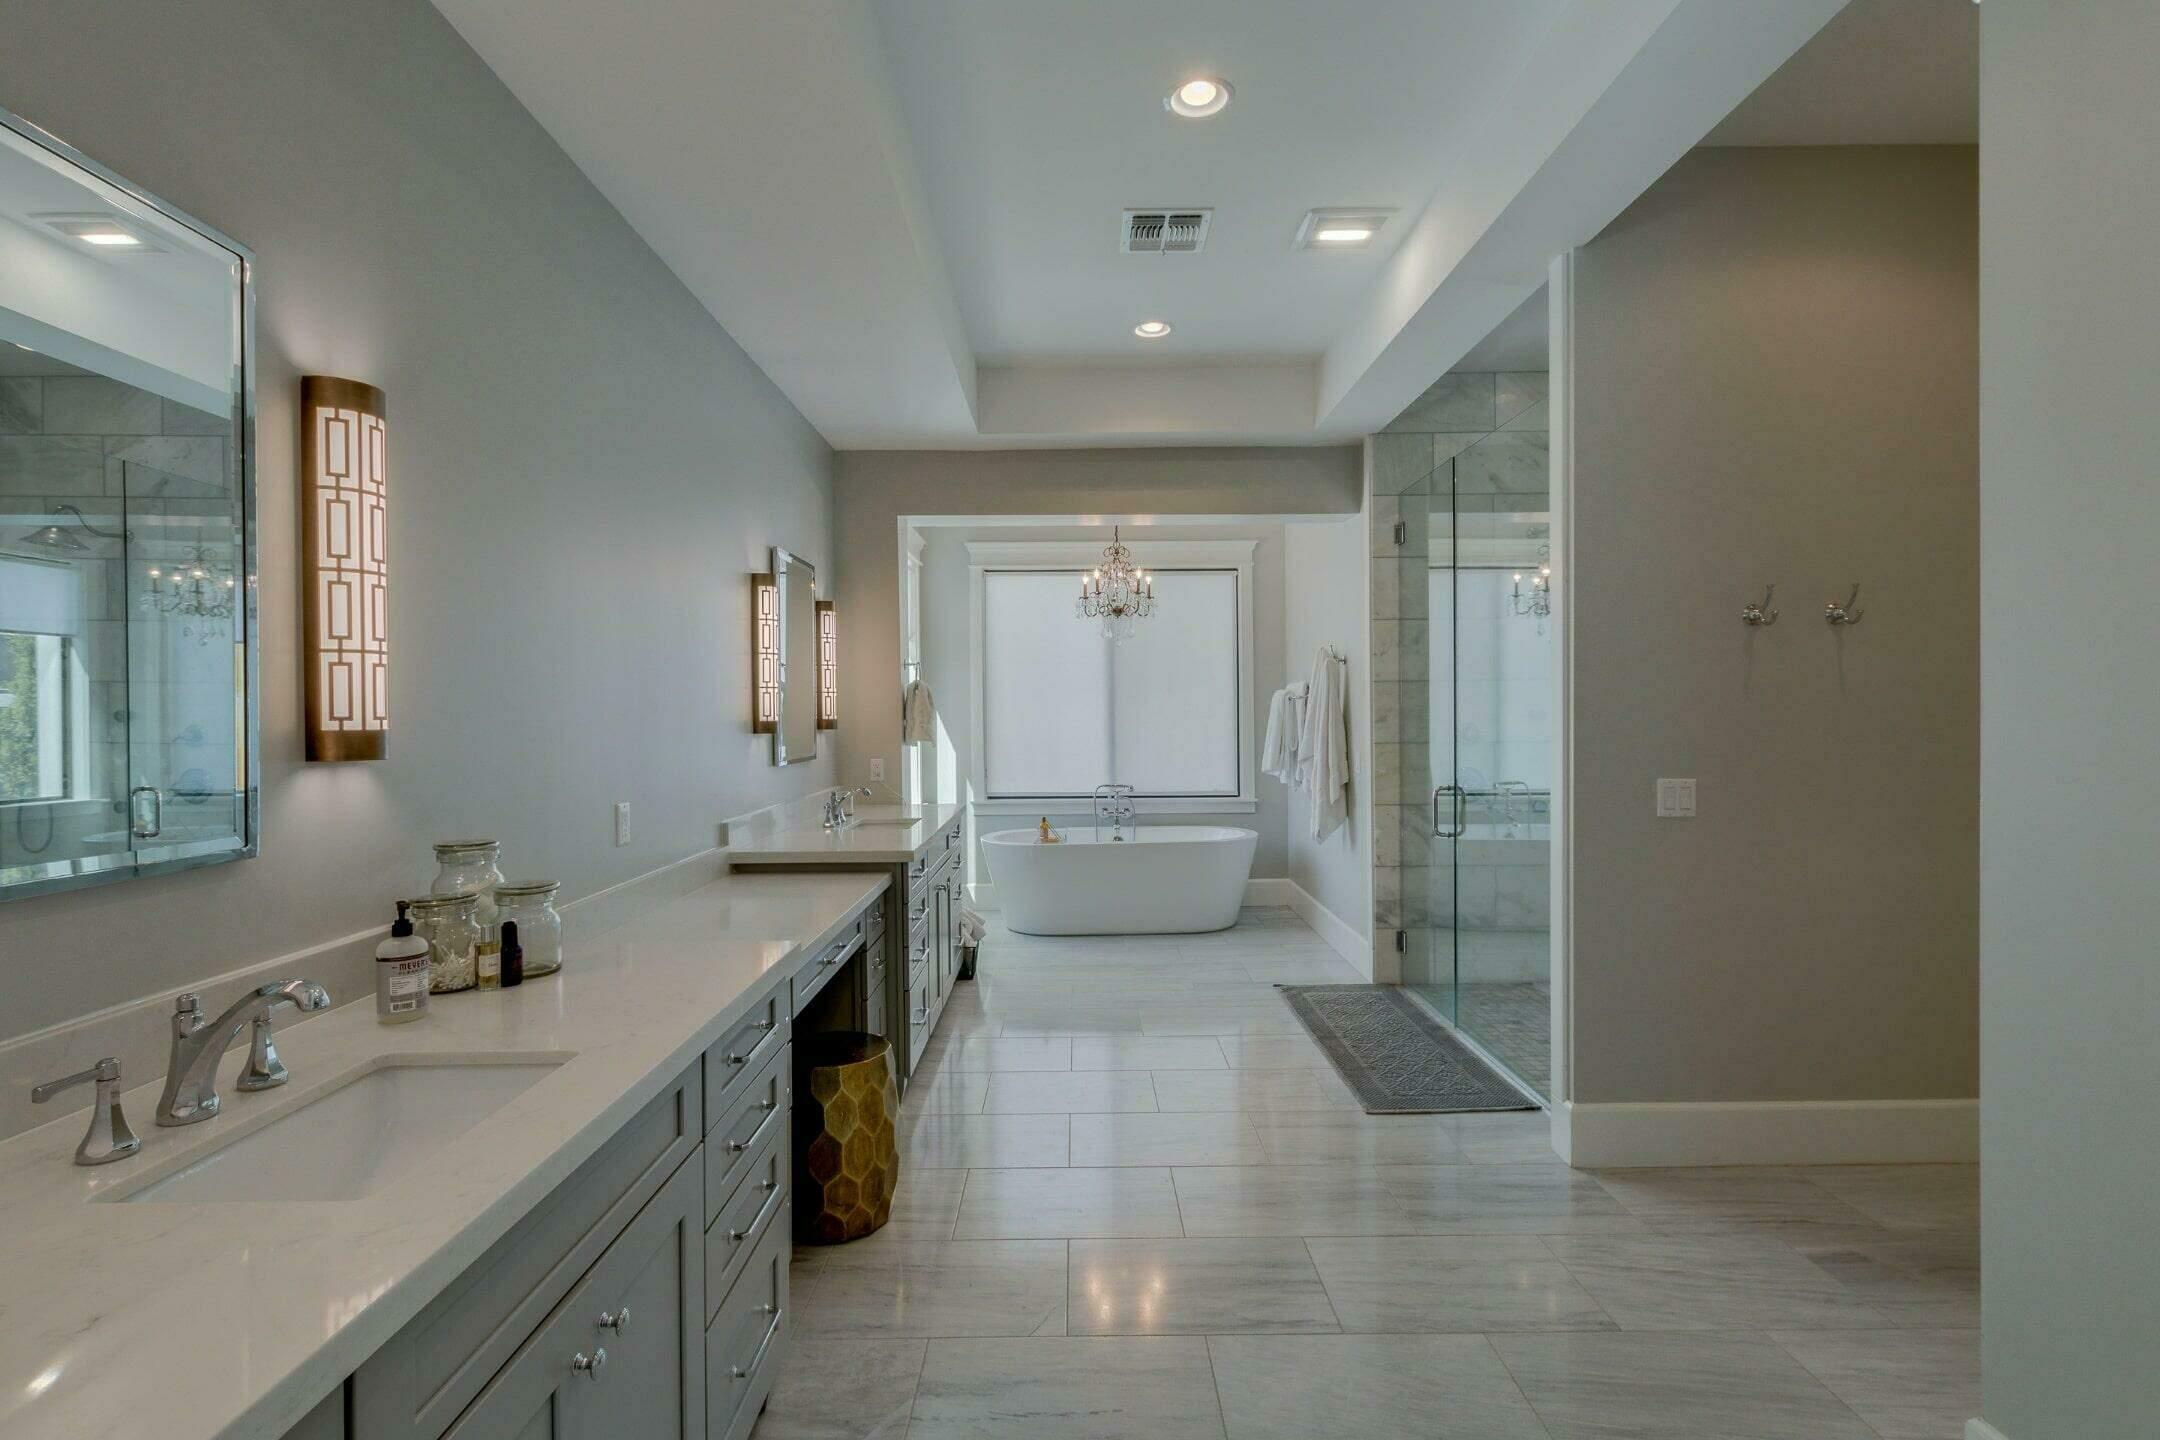 large format tile to transform spaces